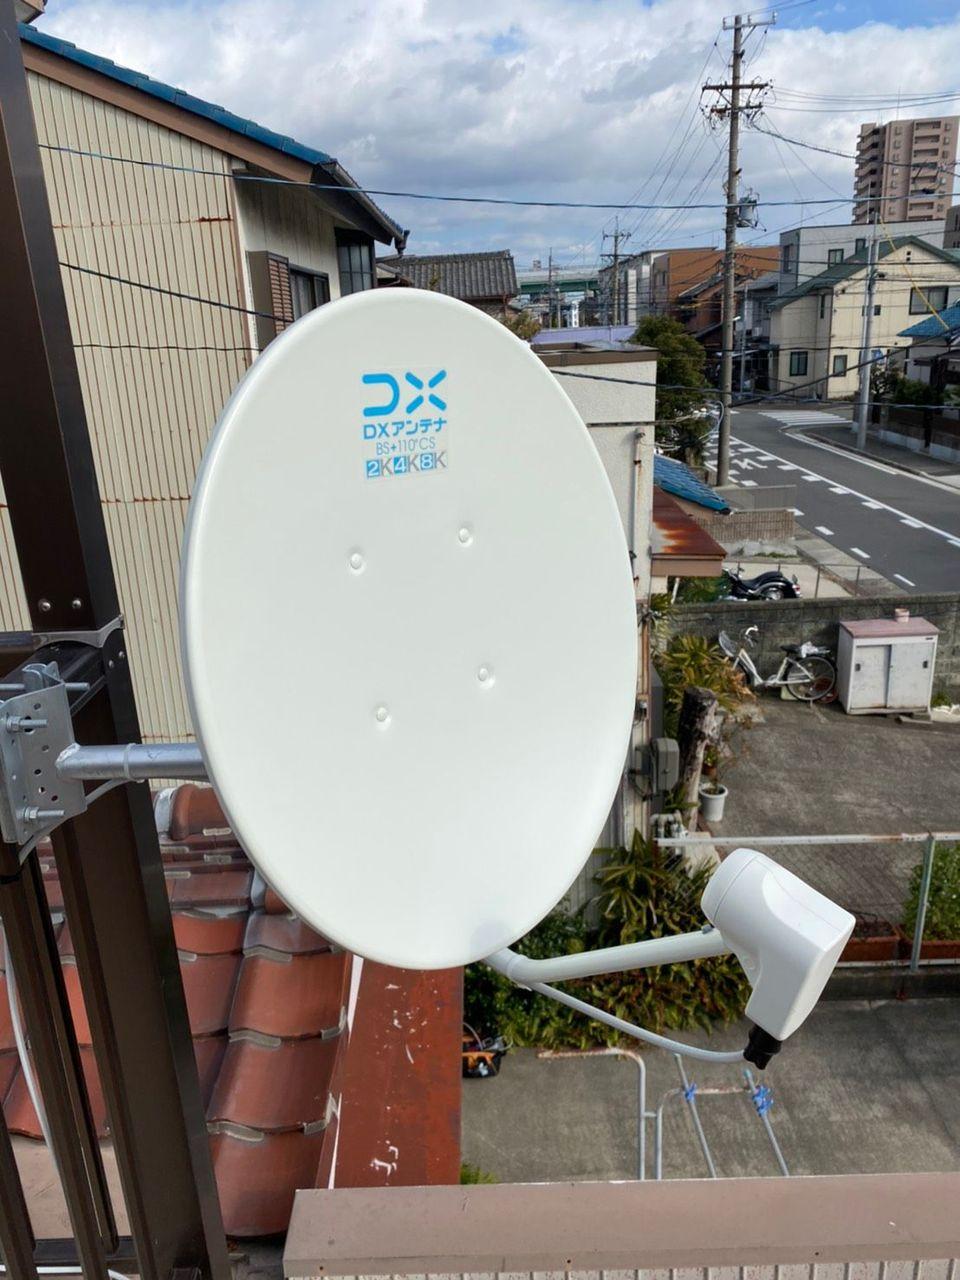 4K8K BSアンテナベランダ設置(愛知県名古屋市港区)